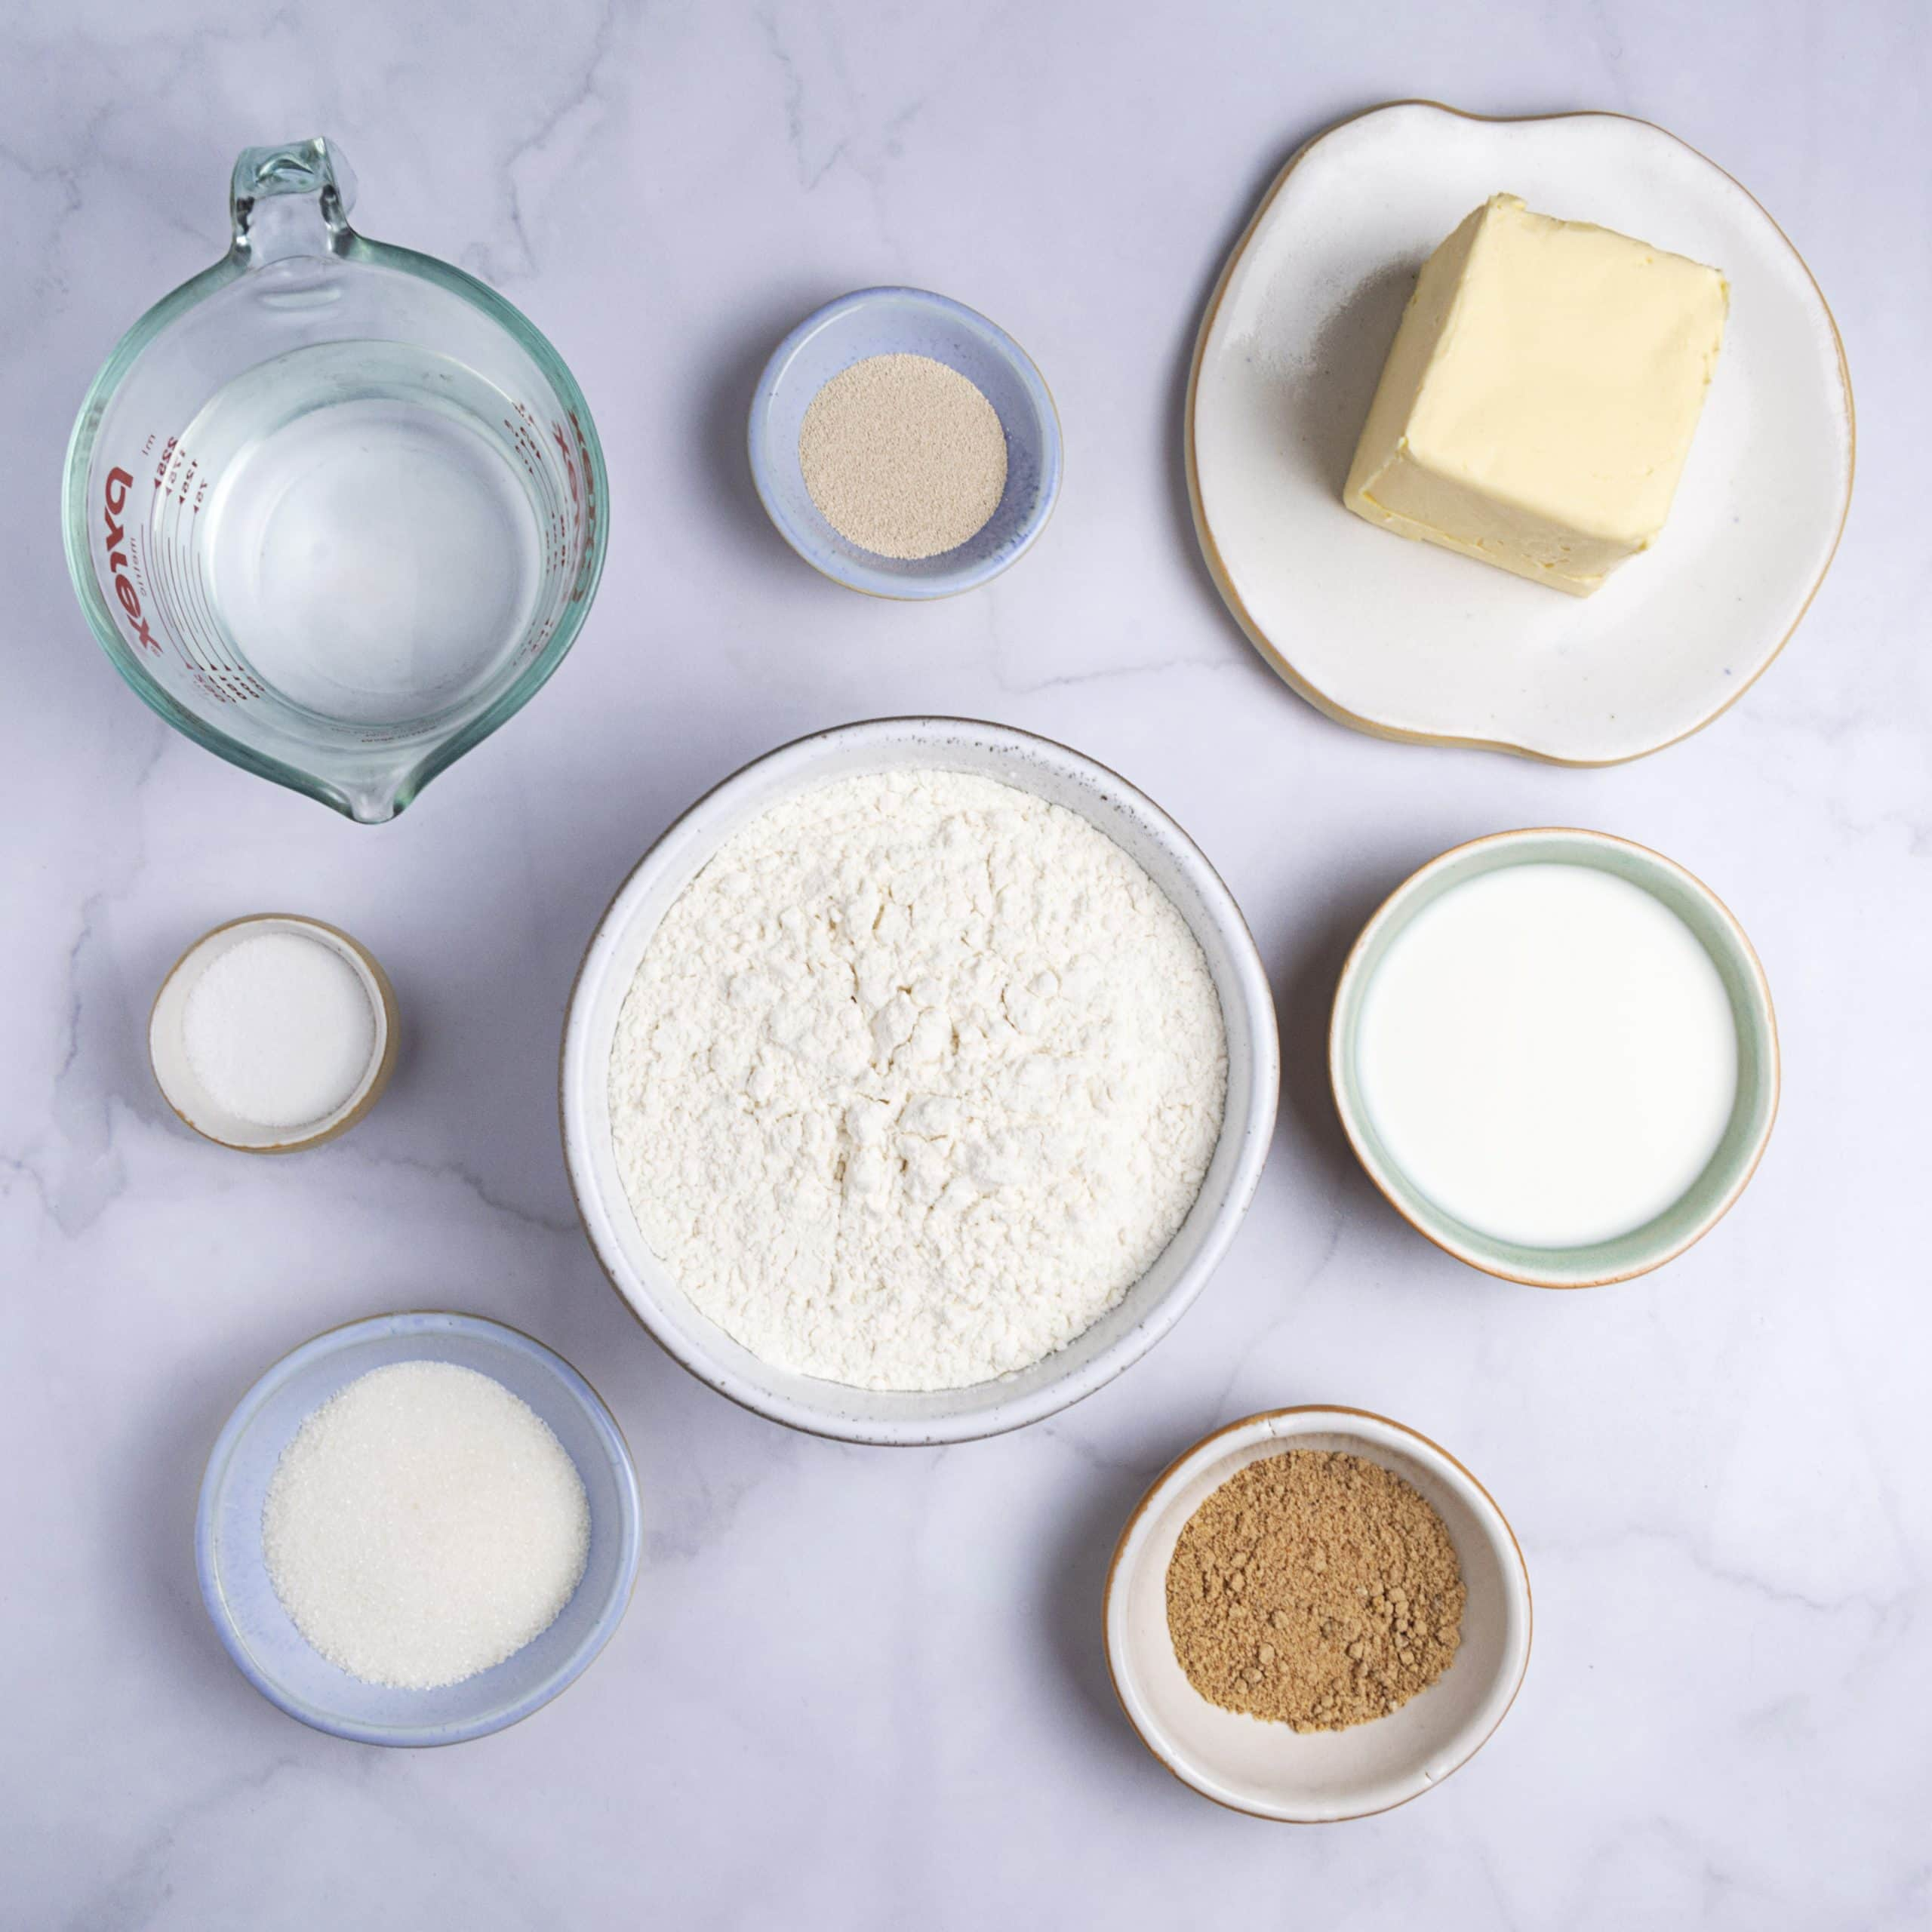 Ingredients for vegan croissants: butter, flour, sugar, water, yeast